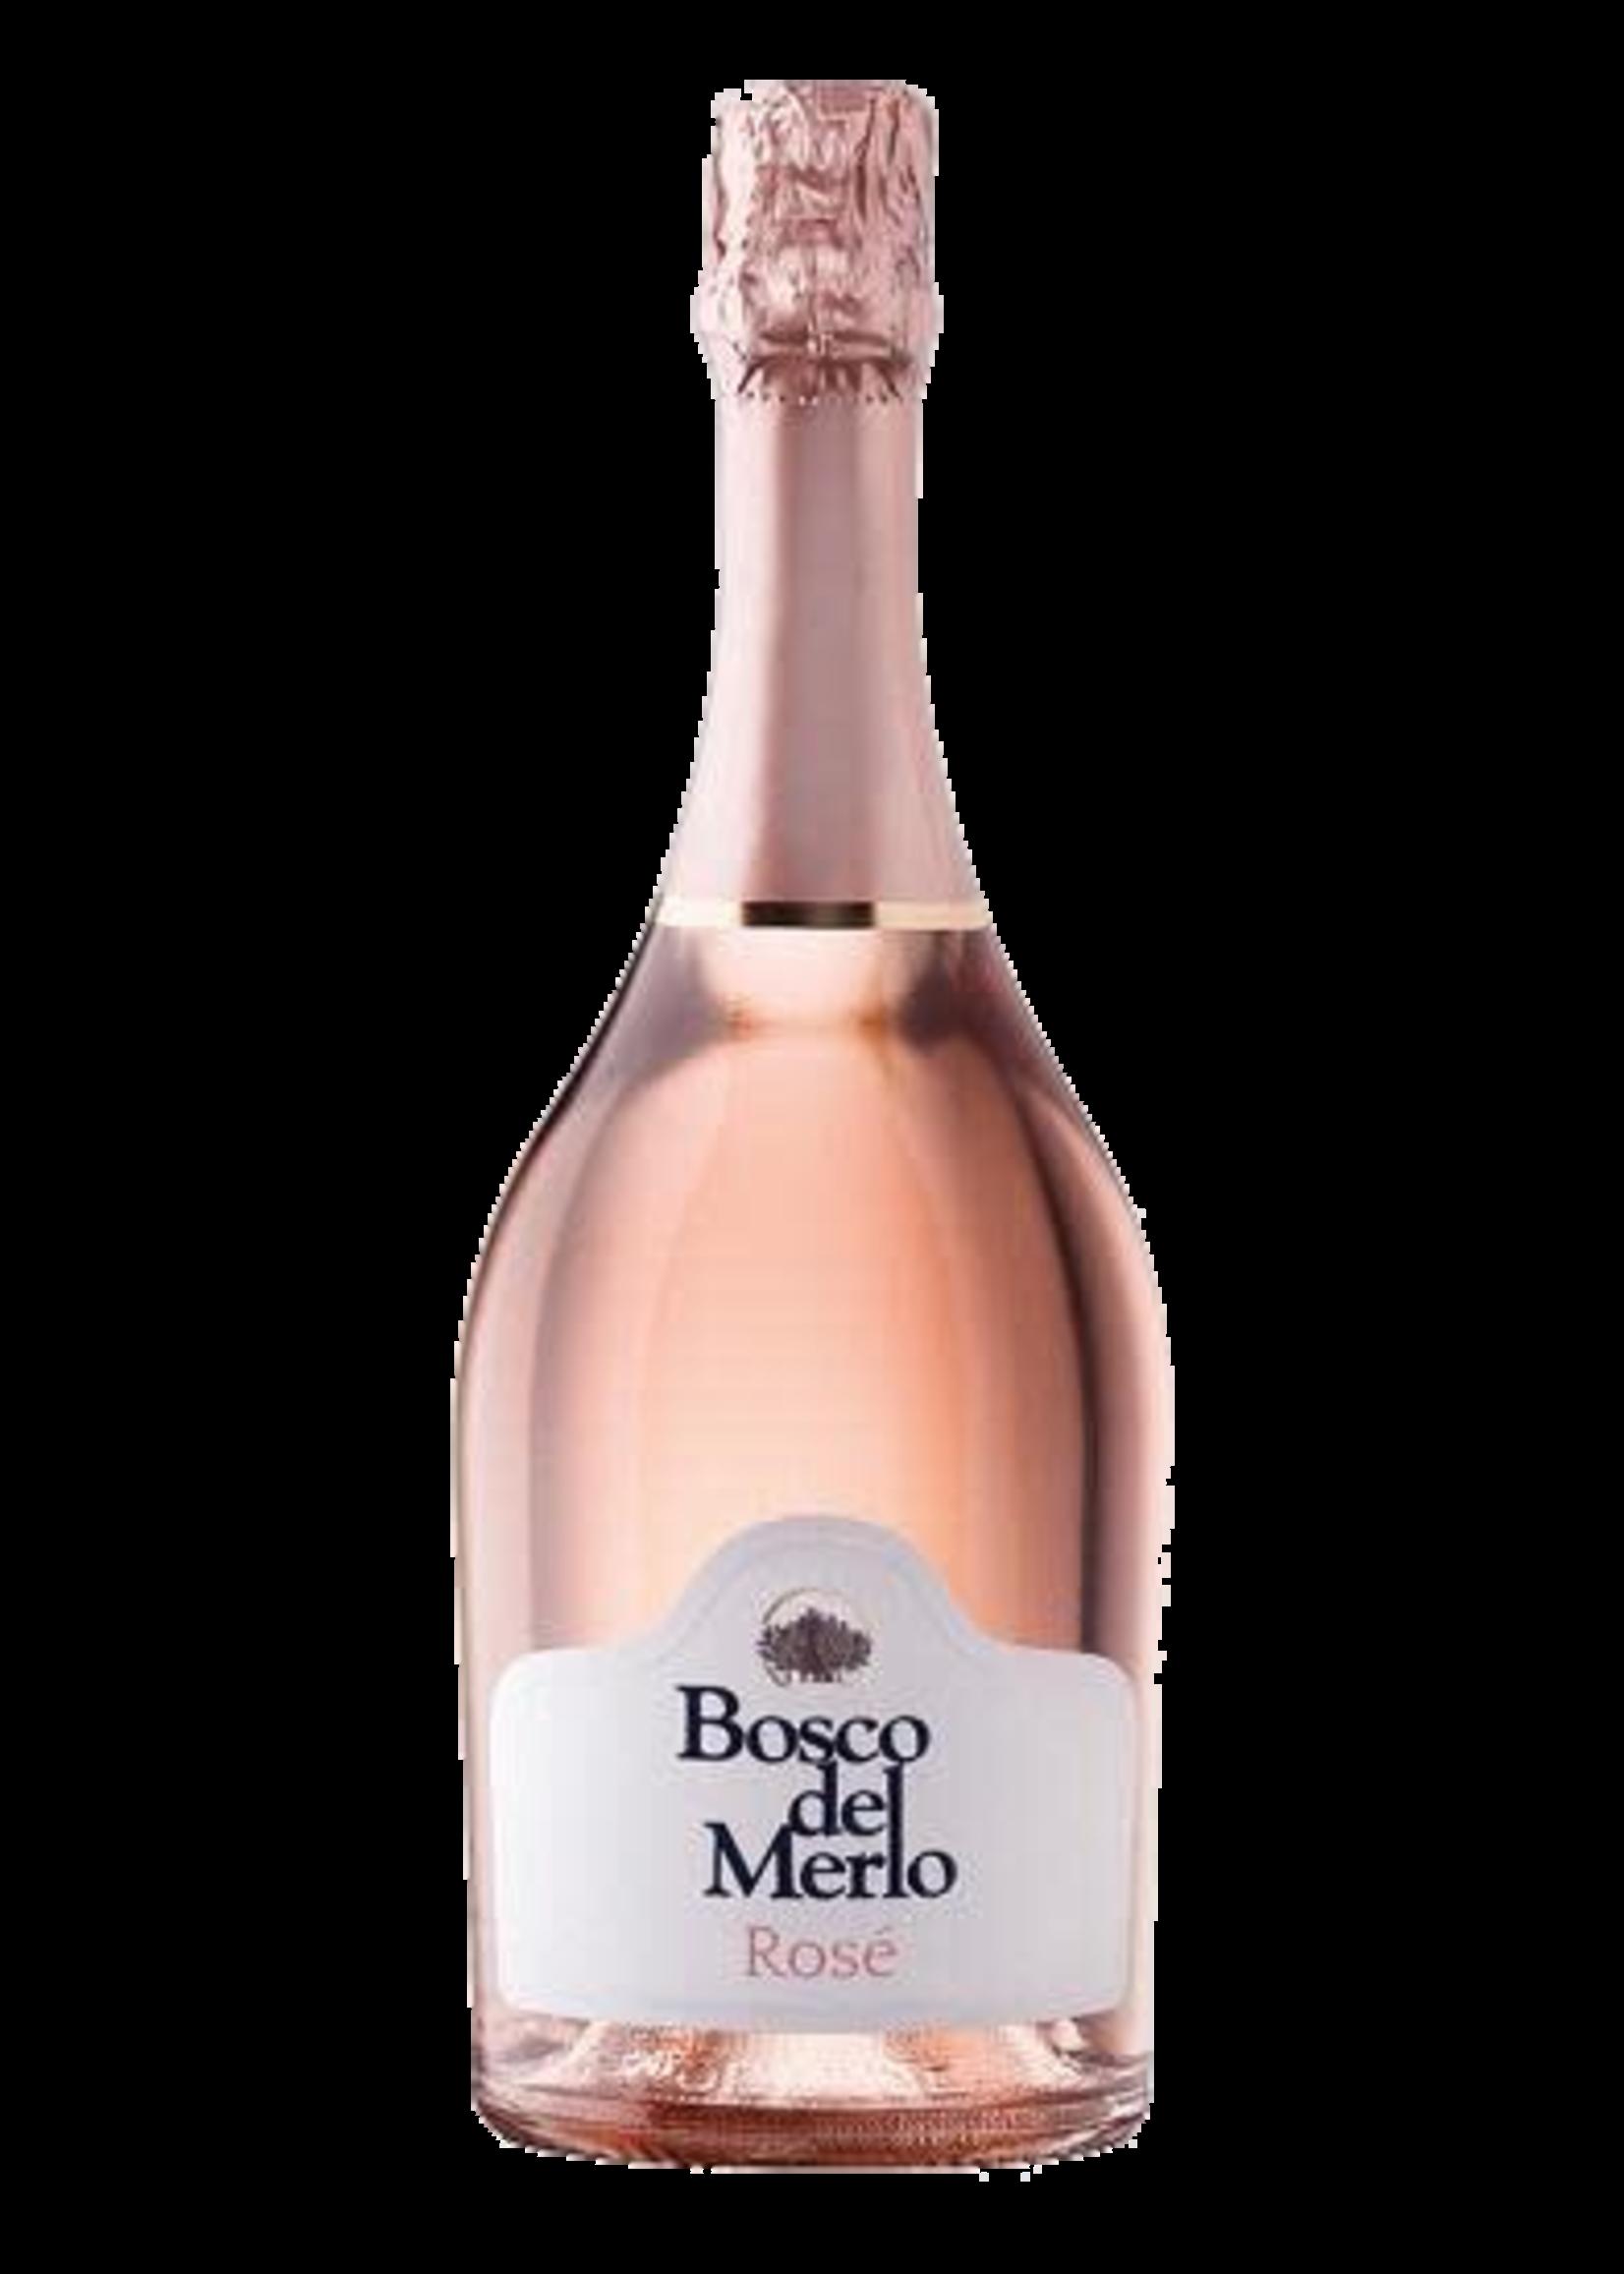 Bosco del Merlo Bosco del Merlo / Sparkling Rose / 750mL